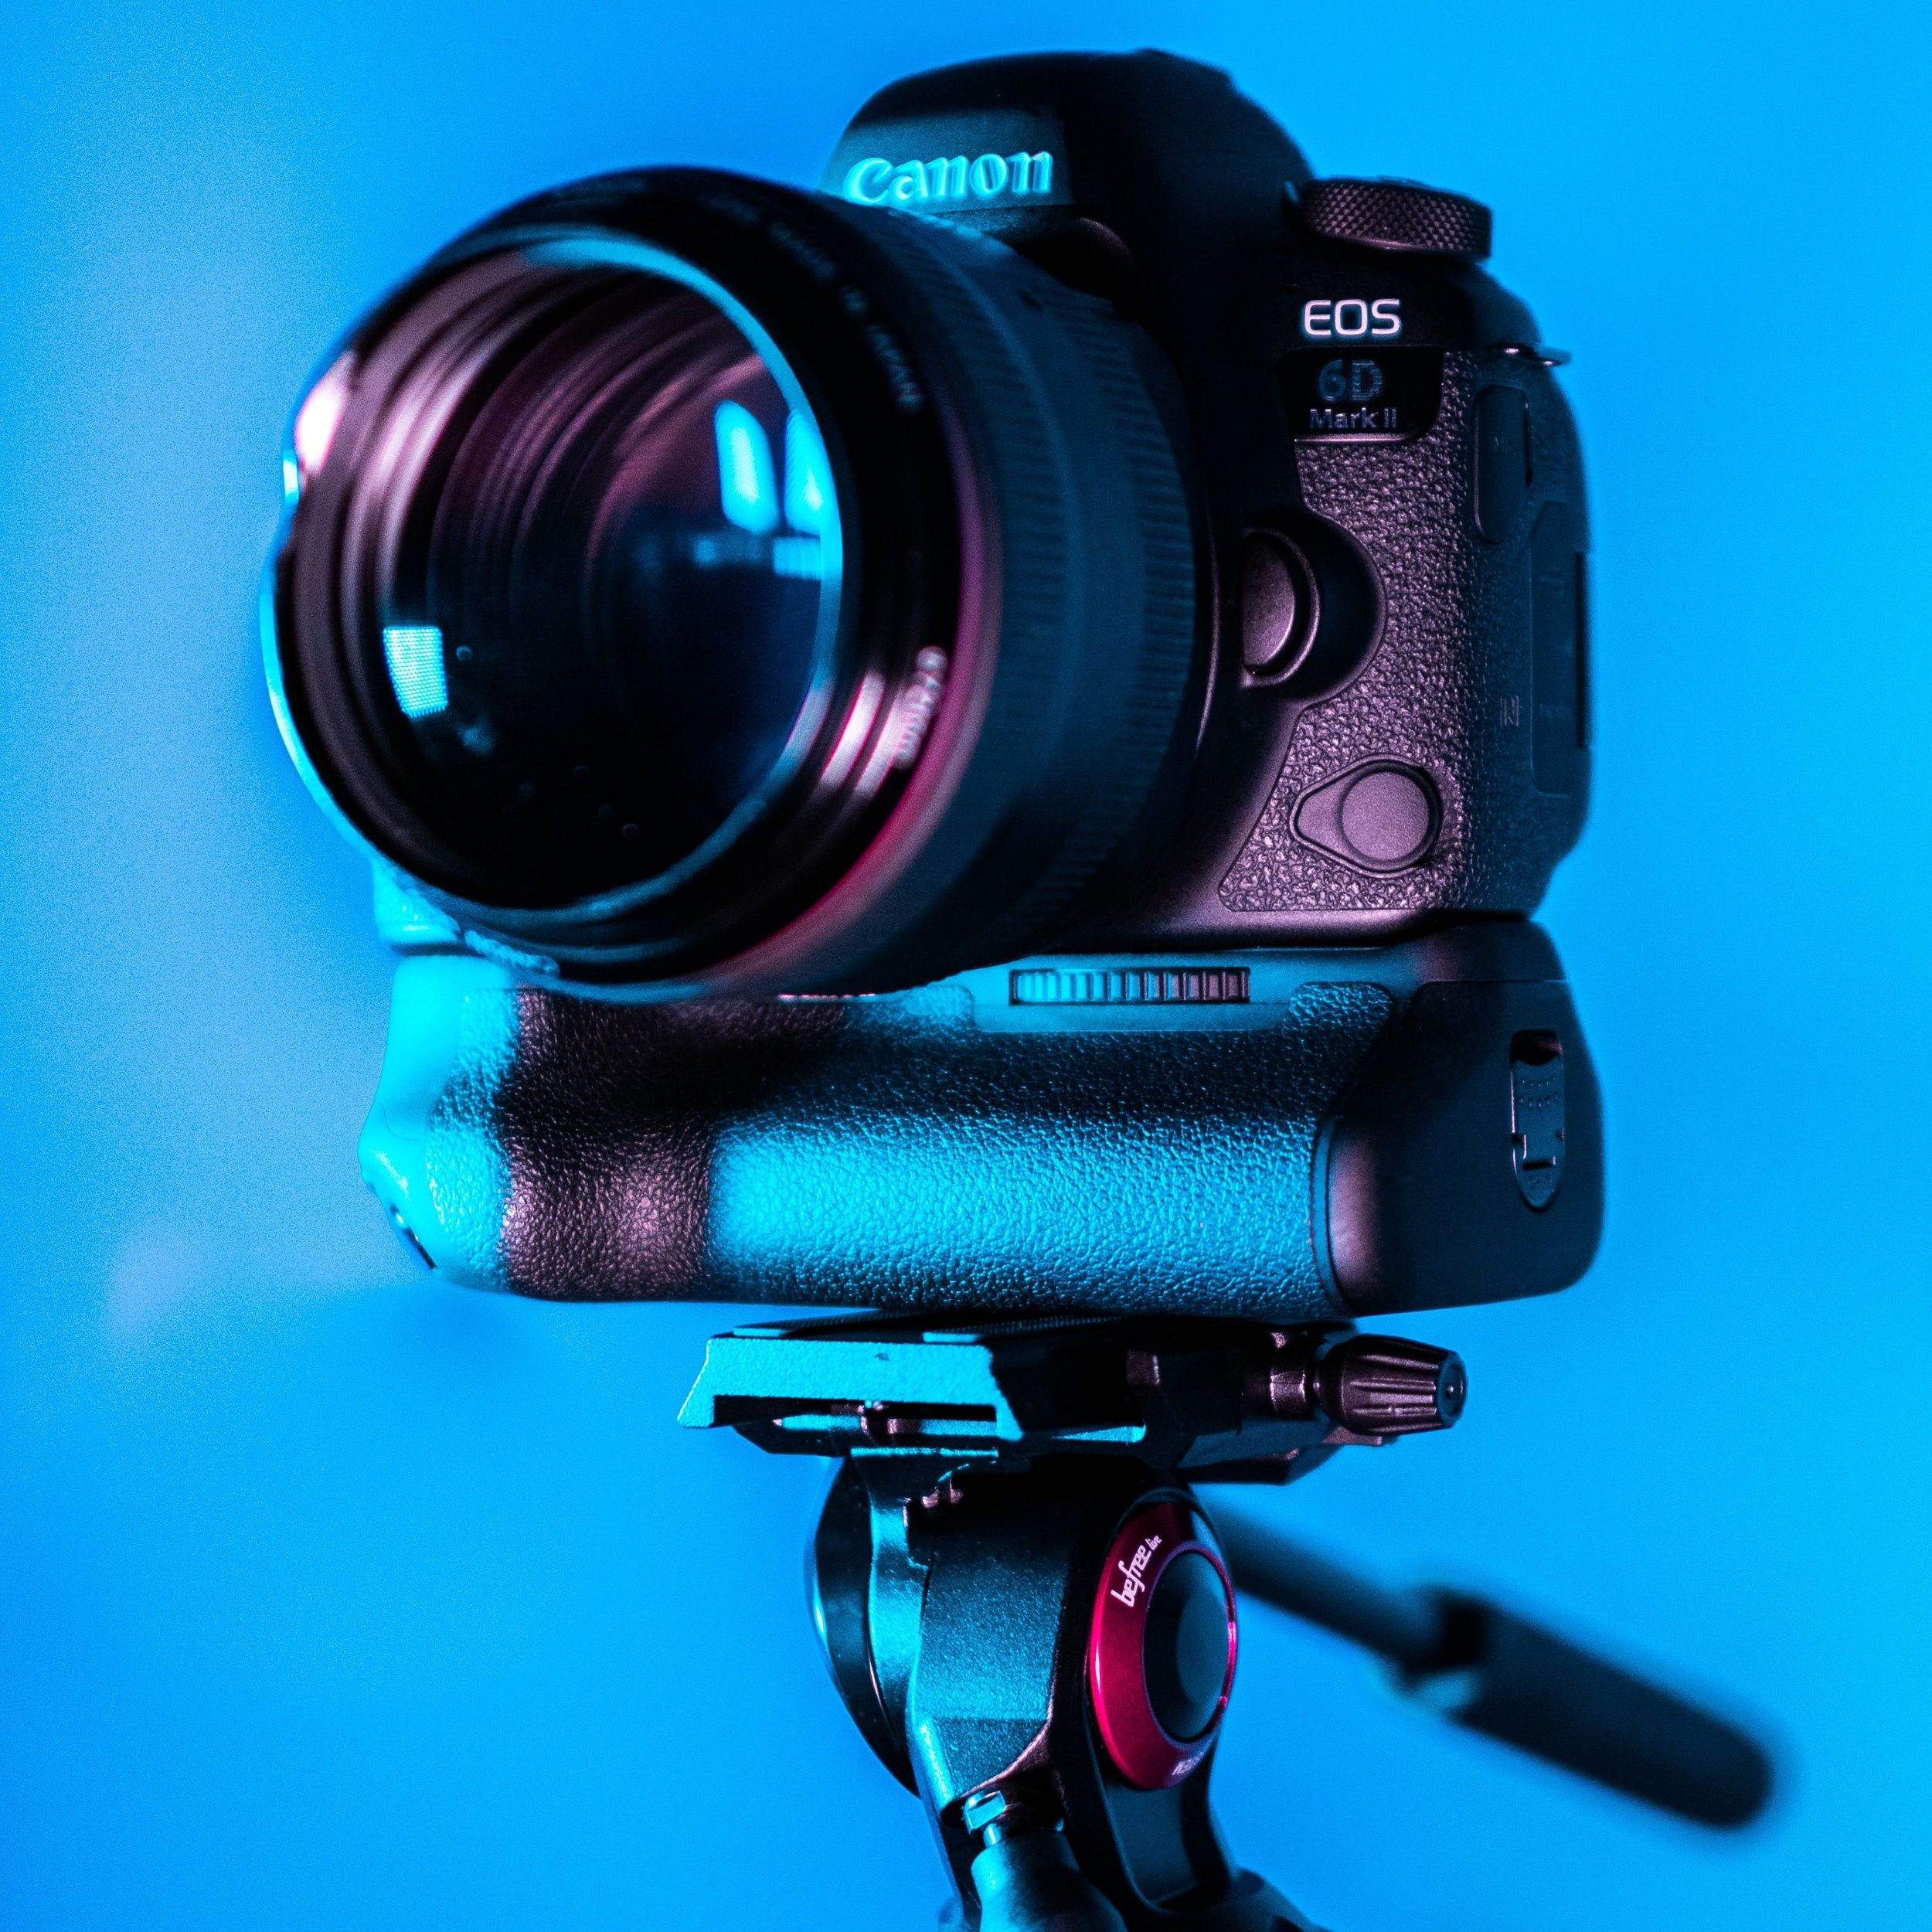 blur-camera-camera-equipment-1787235.jpg